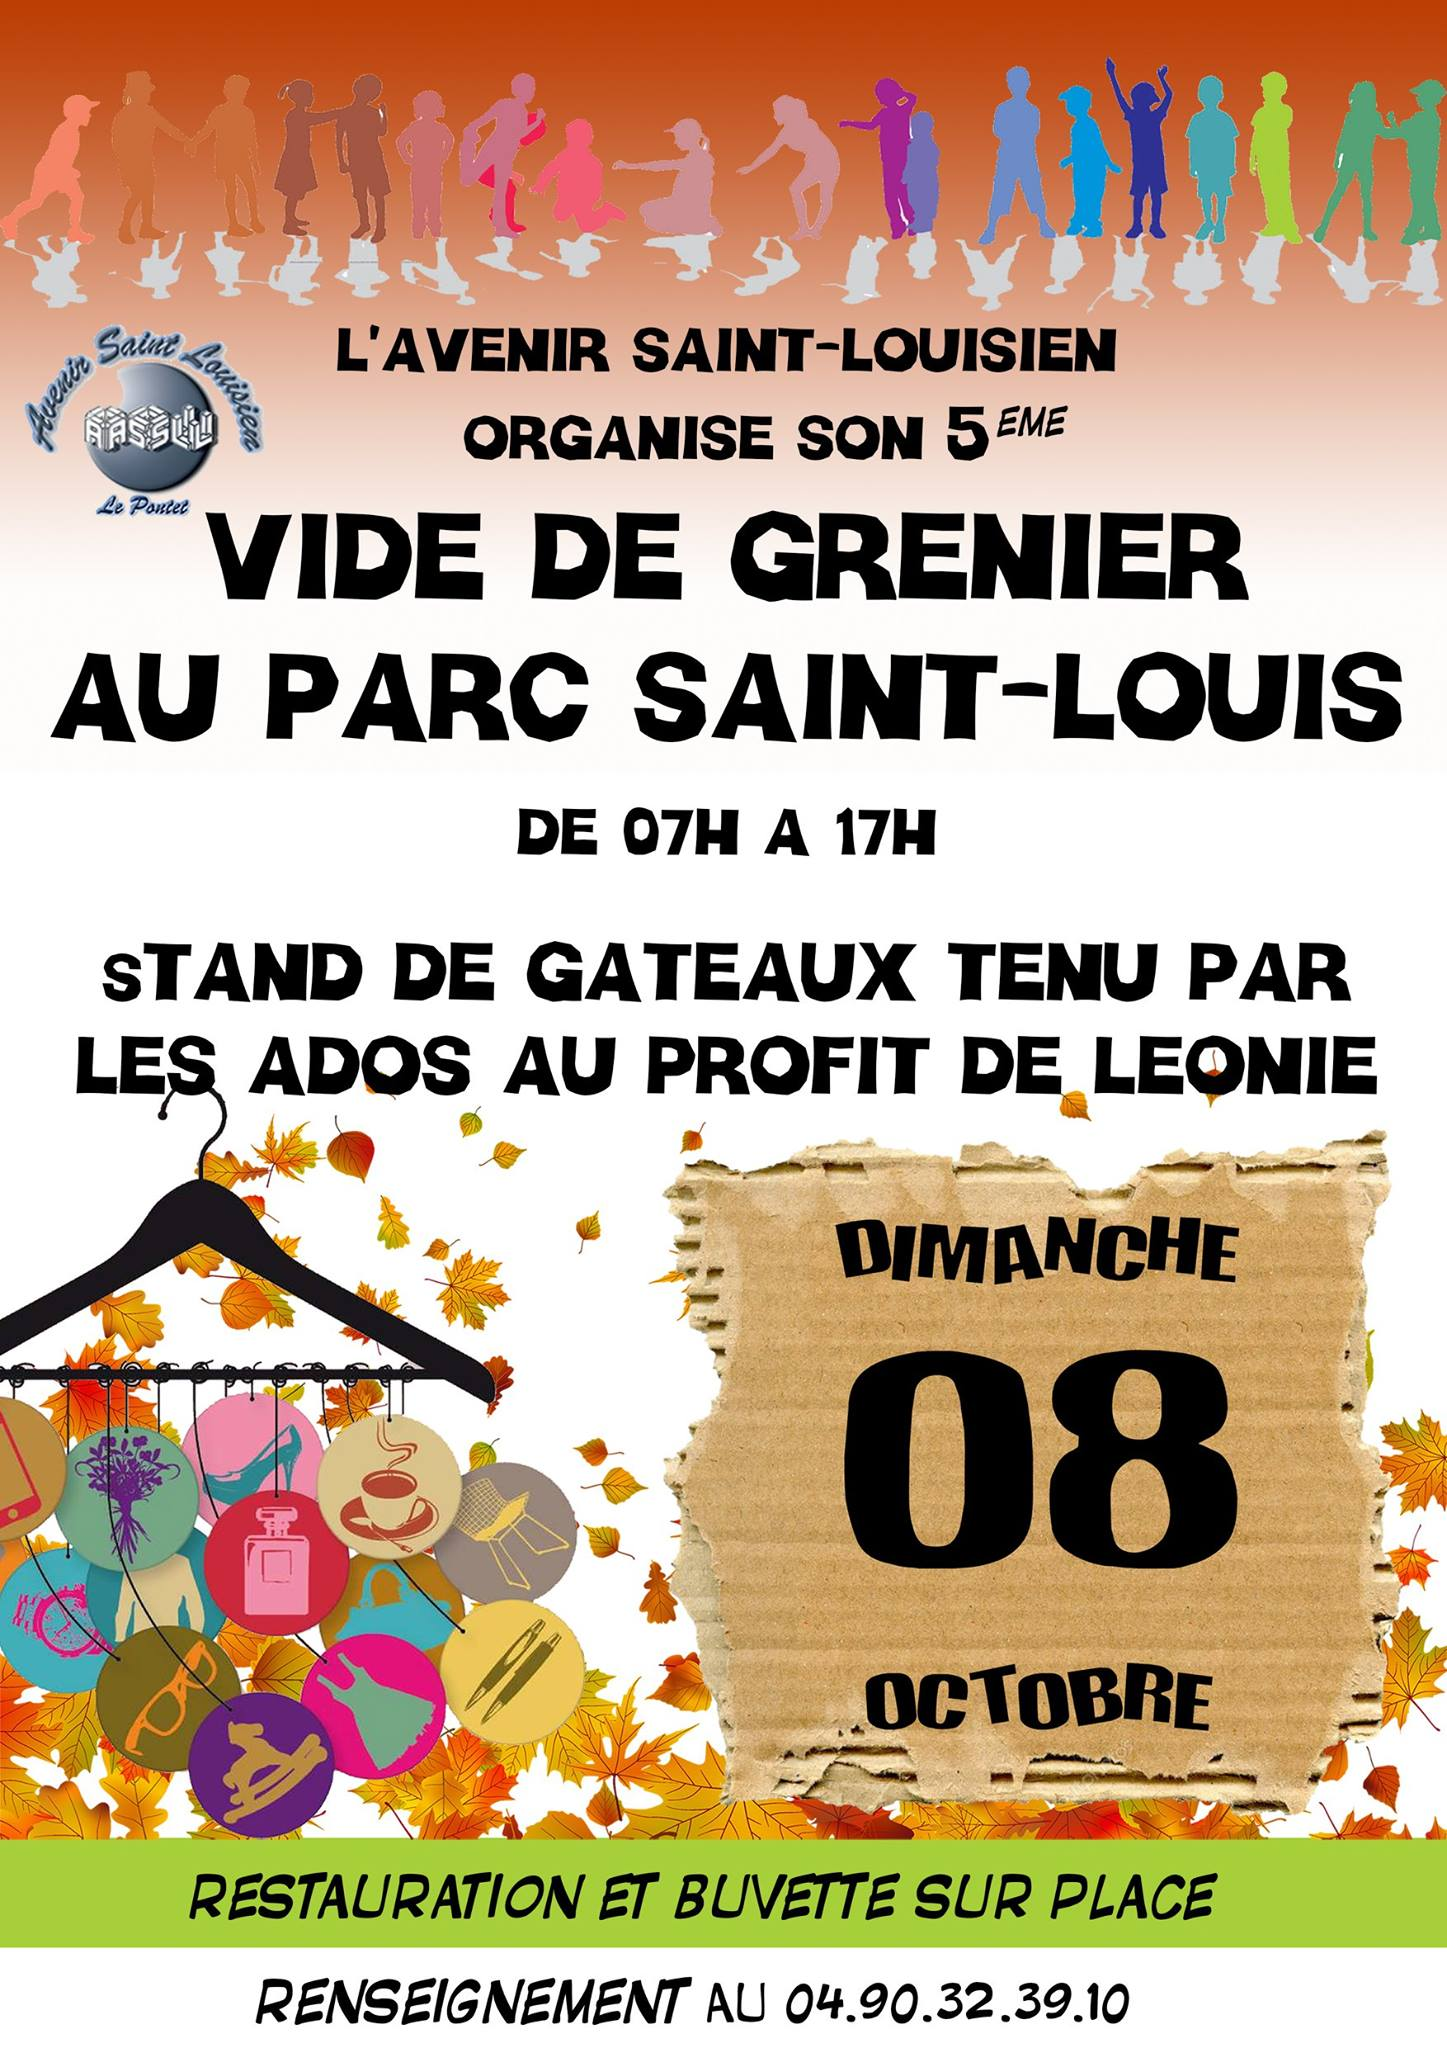 Avenir St Louisien